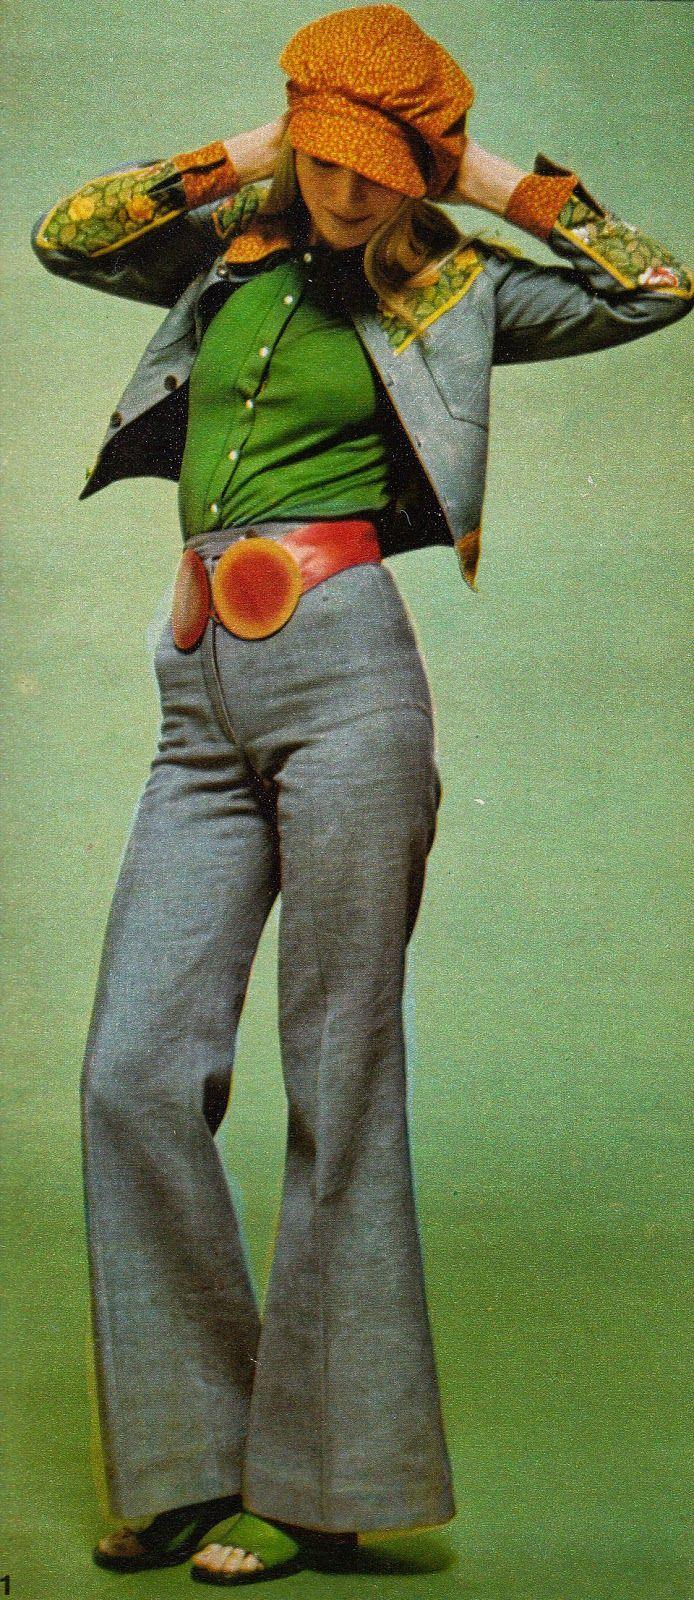 1971 Fashion 70s pant suit wide leg jacket grey blue red belt leather green shirt hat prairie girl disco hippie